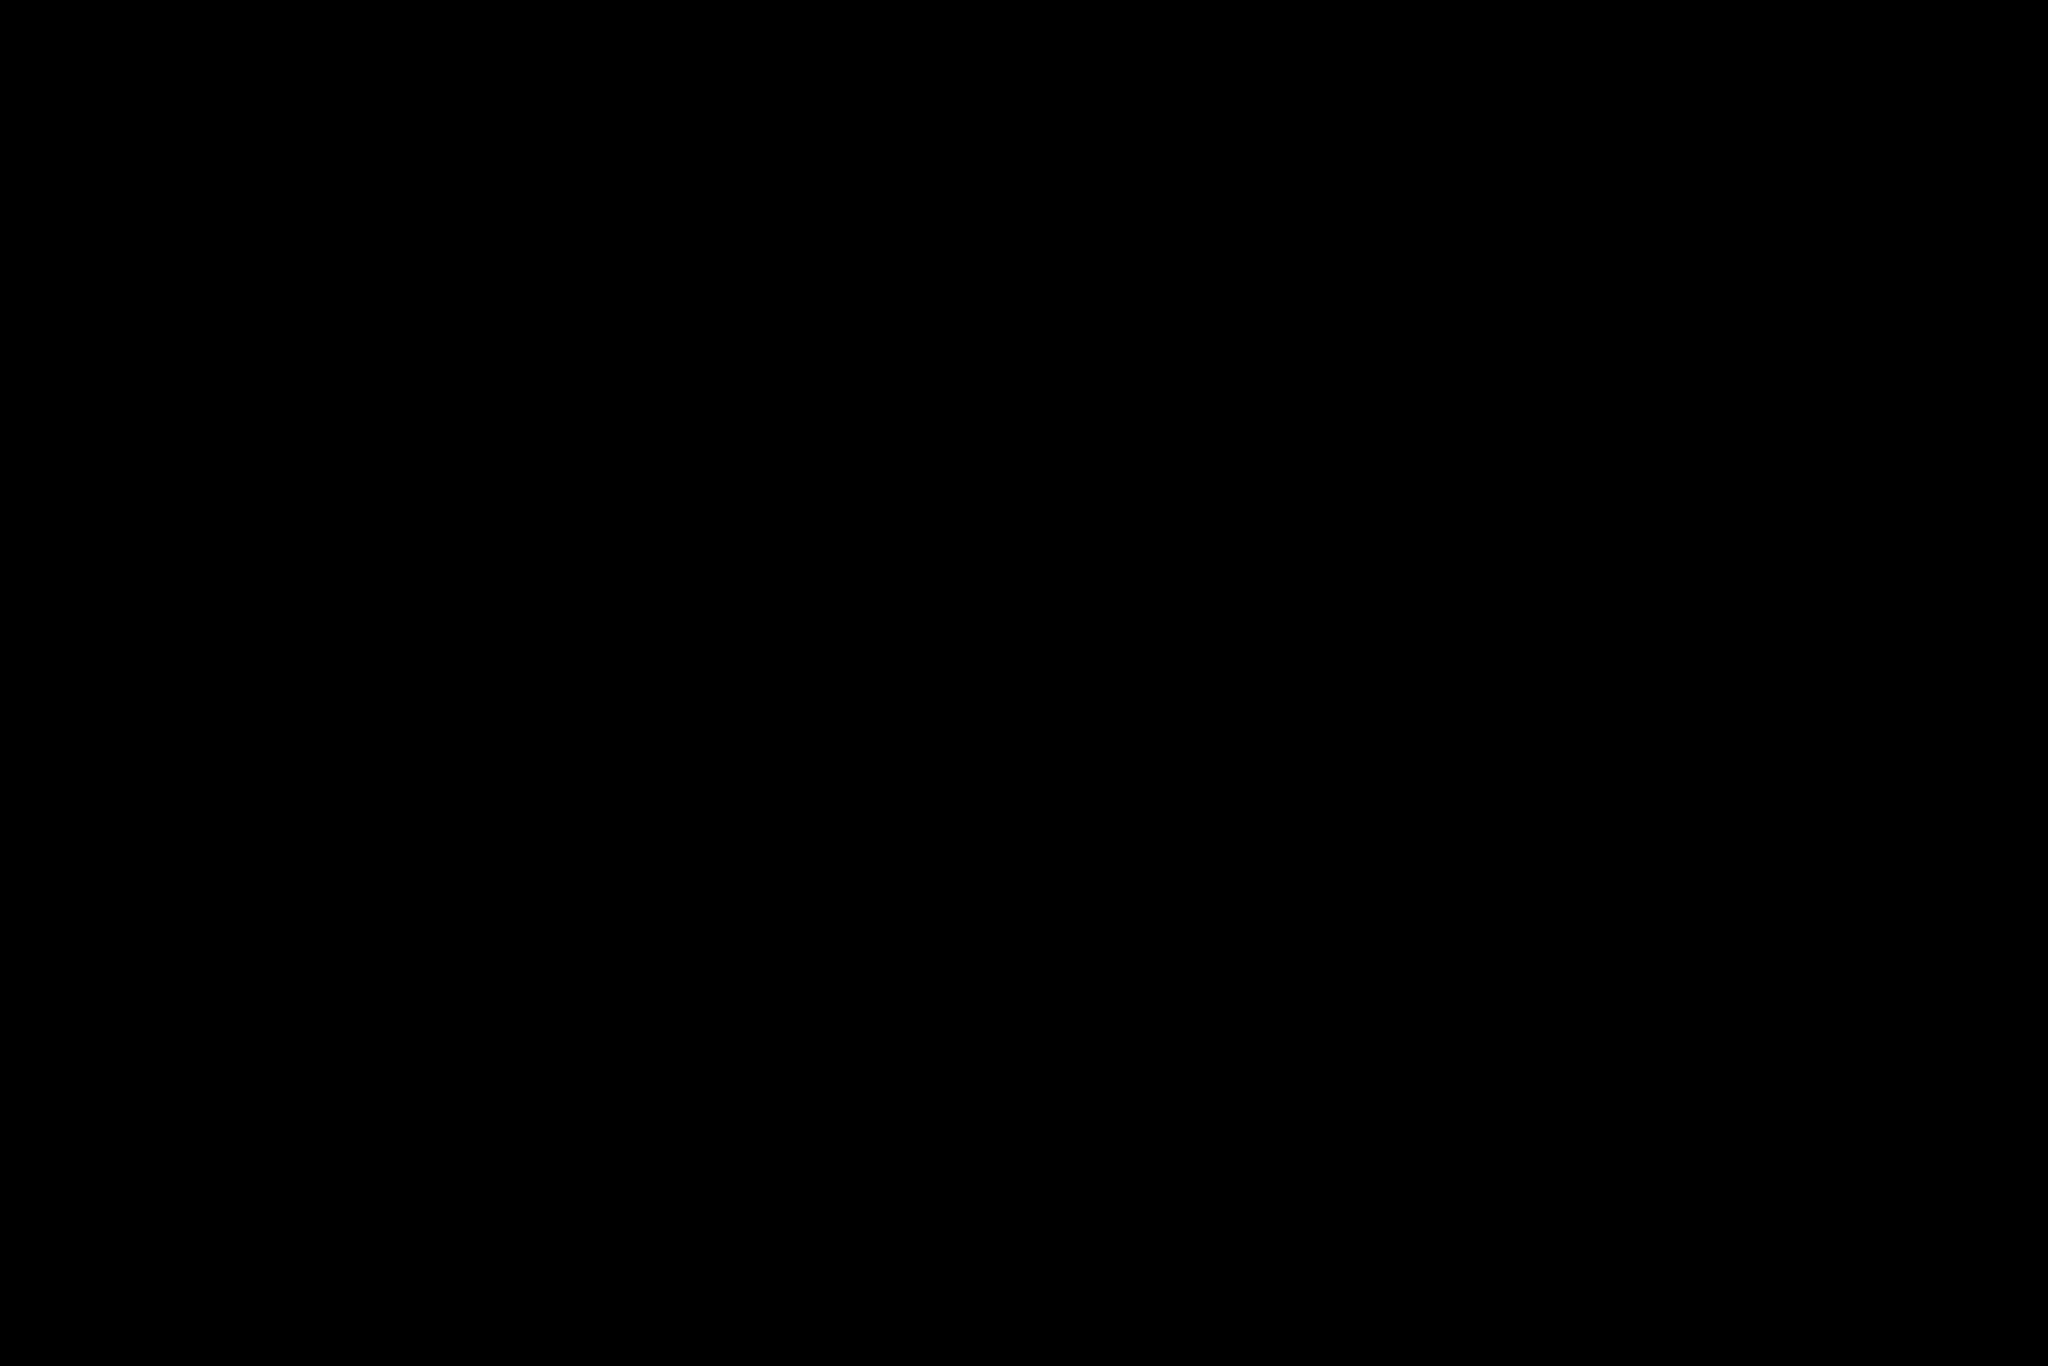 Douglas fijnbezaagde plank | 2.5 x 25 cm